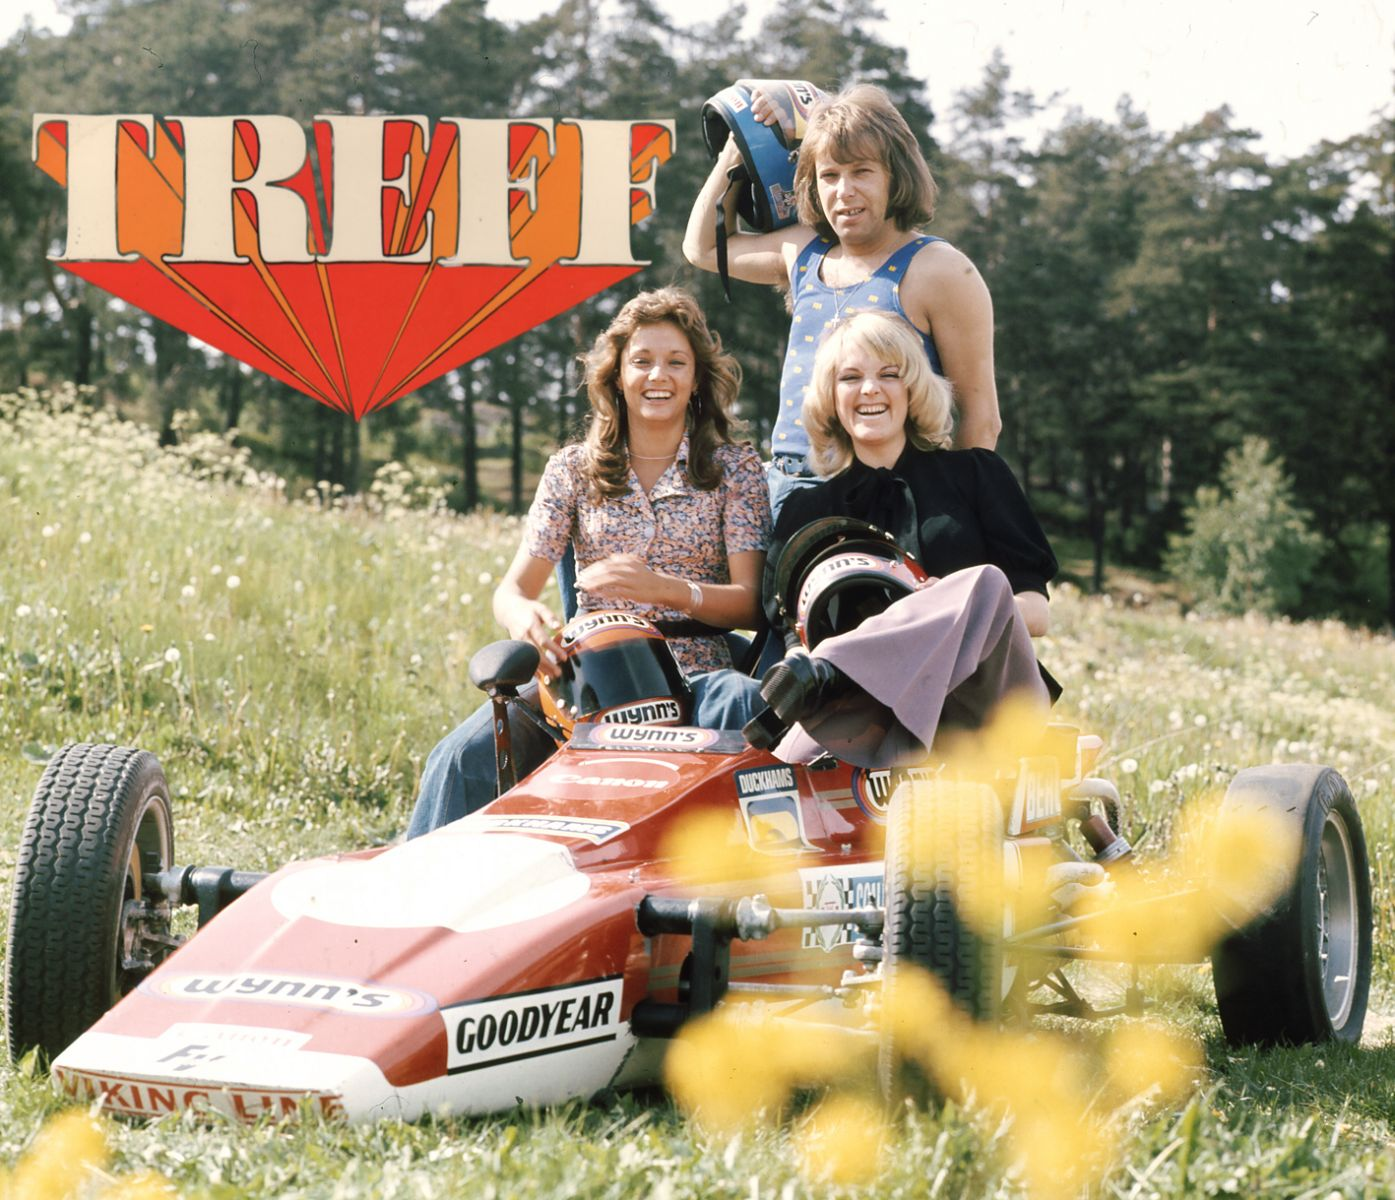 Treff Complete